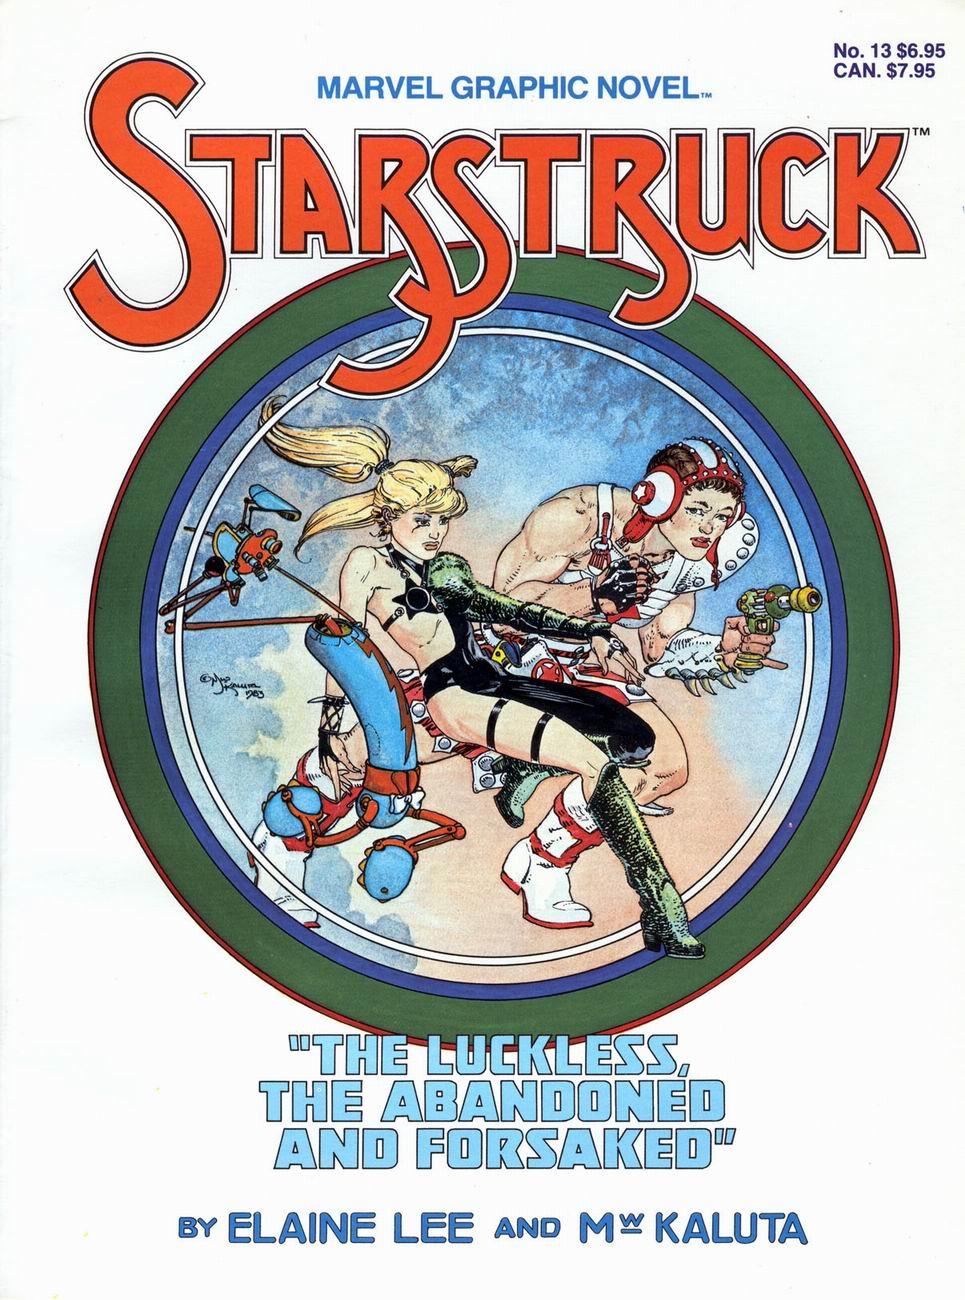 Marvel Graphic Novel 13_-_Starstruck Page 1